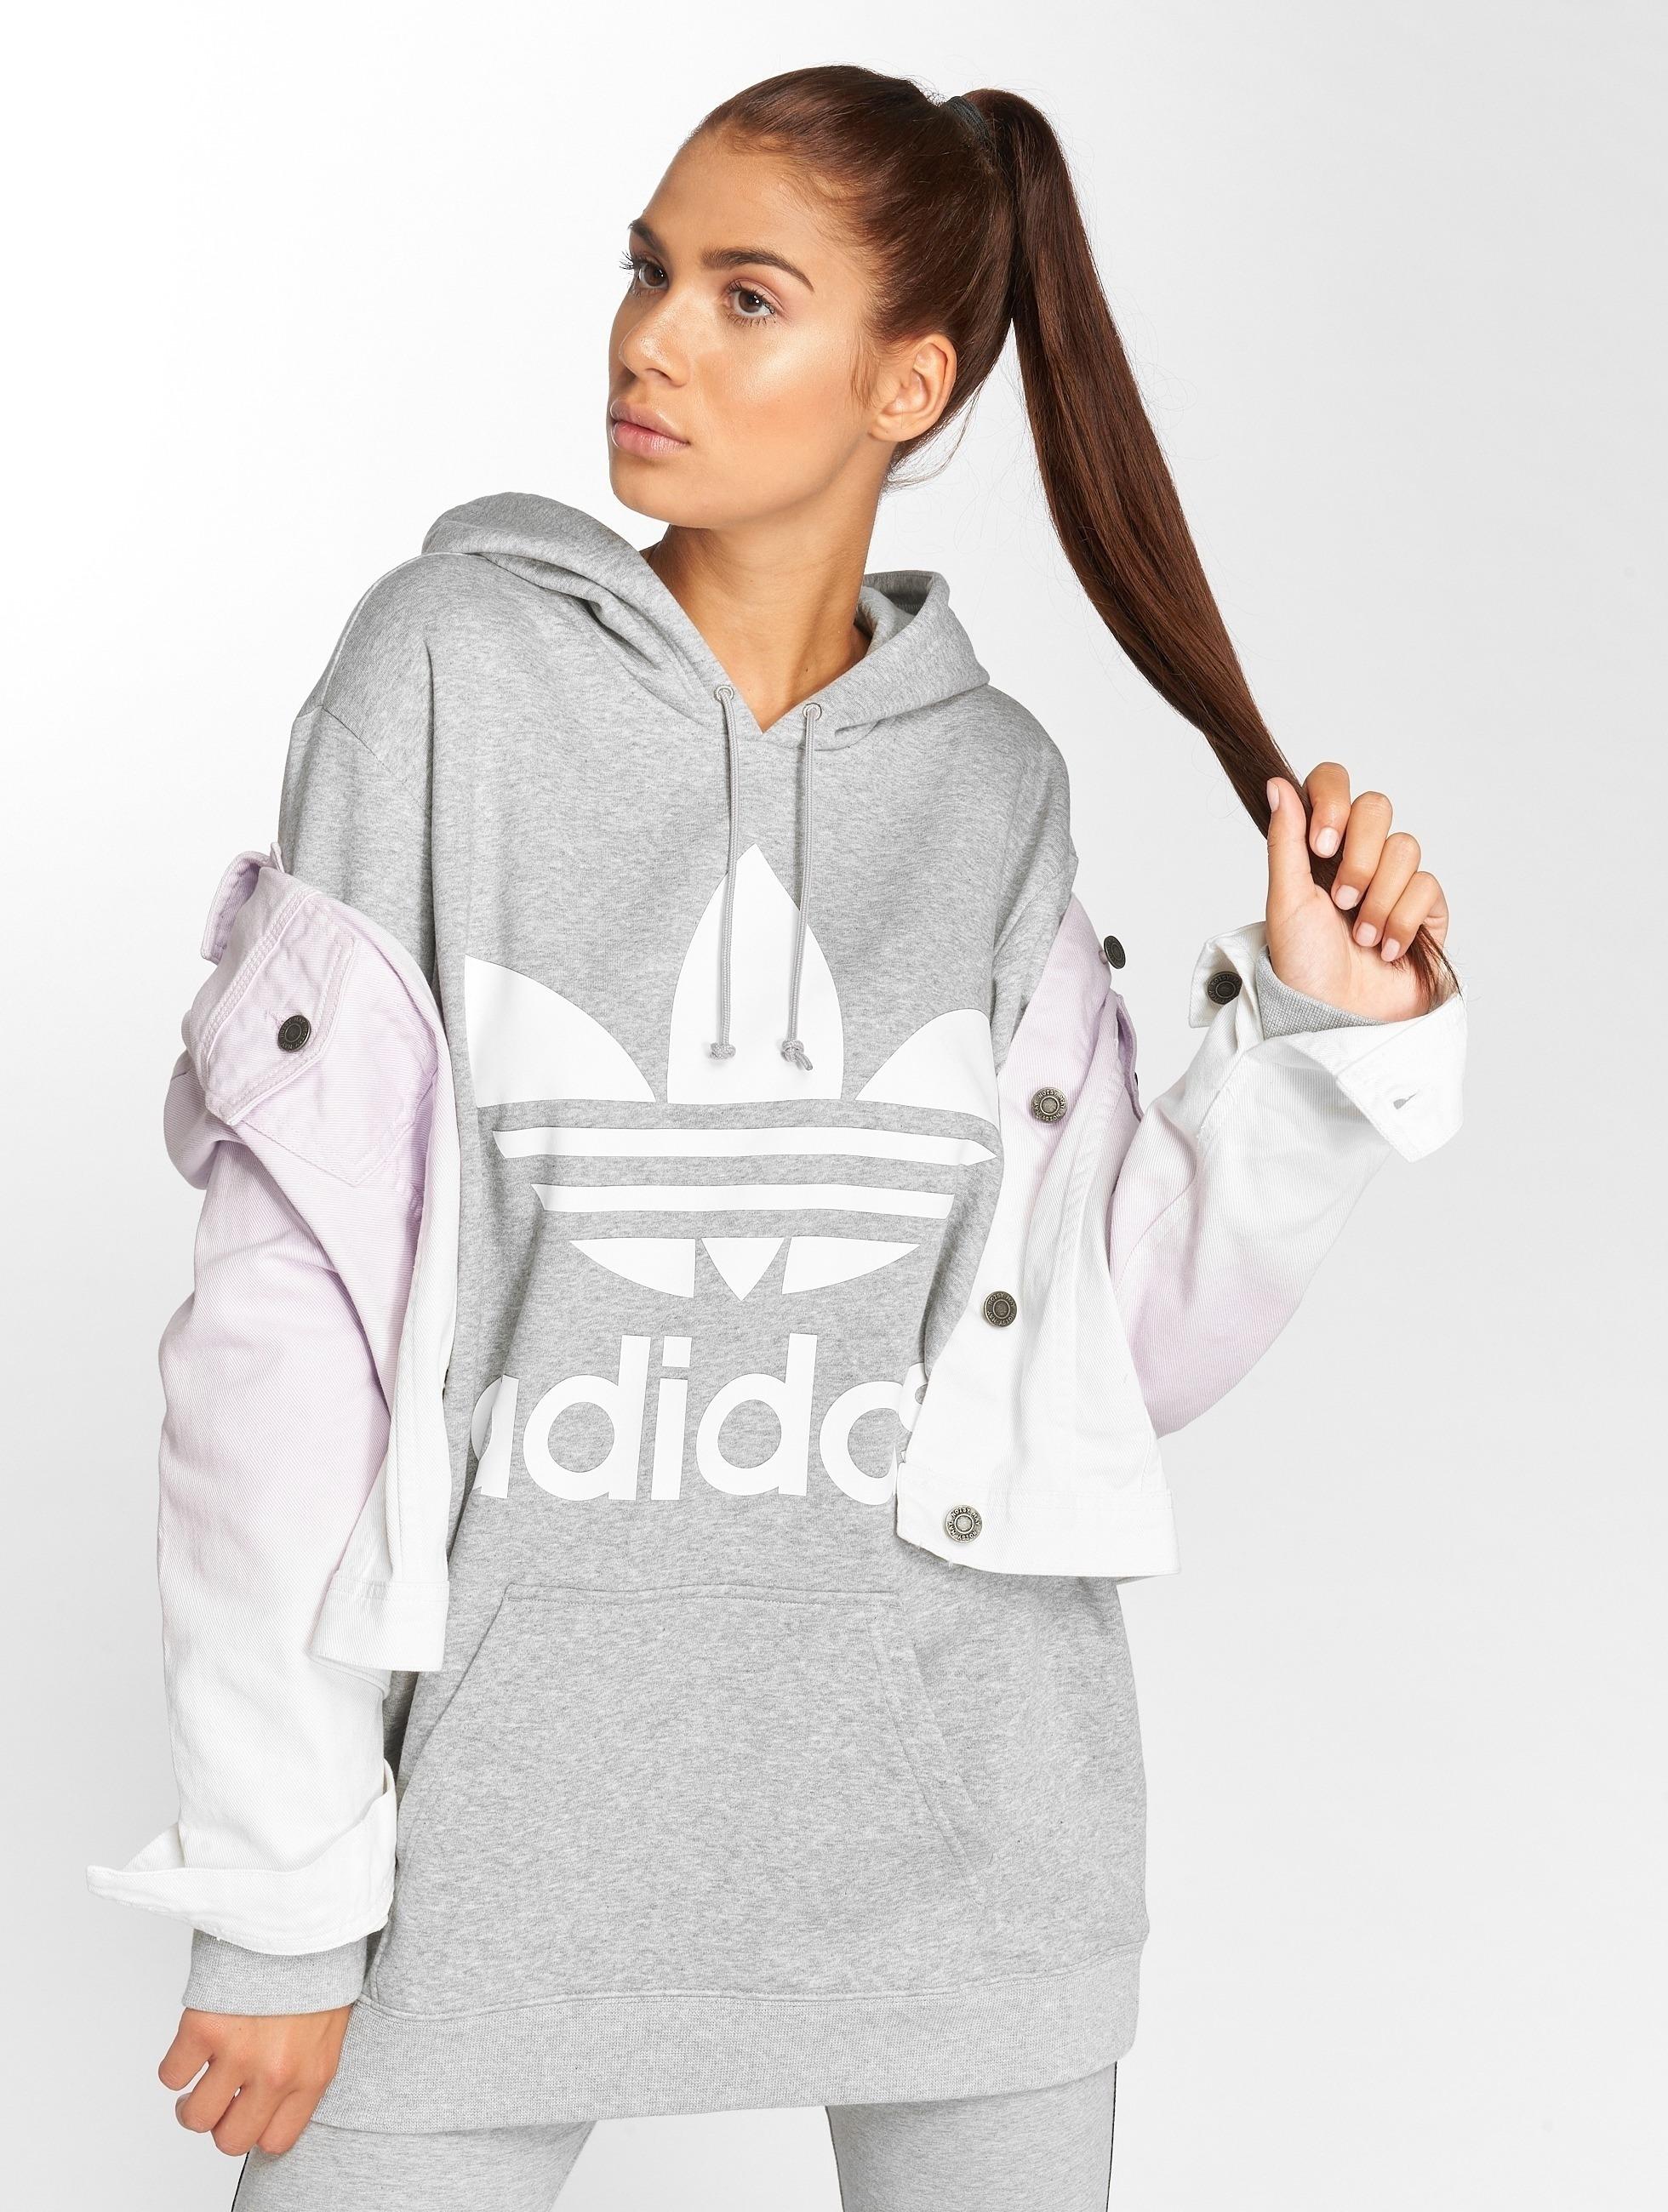 Adidas-originals Naisten ALE Vaatteet netistä  fff477534d